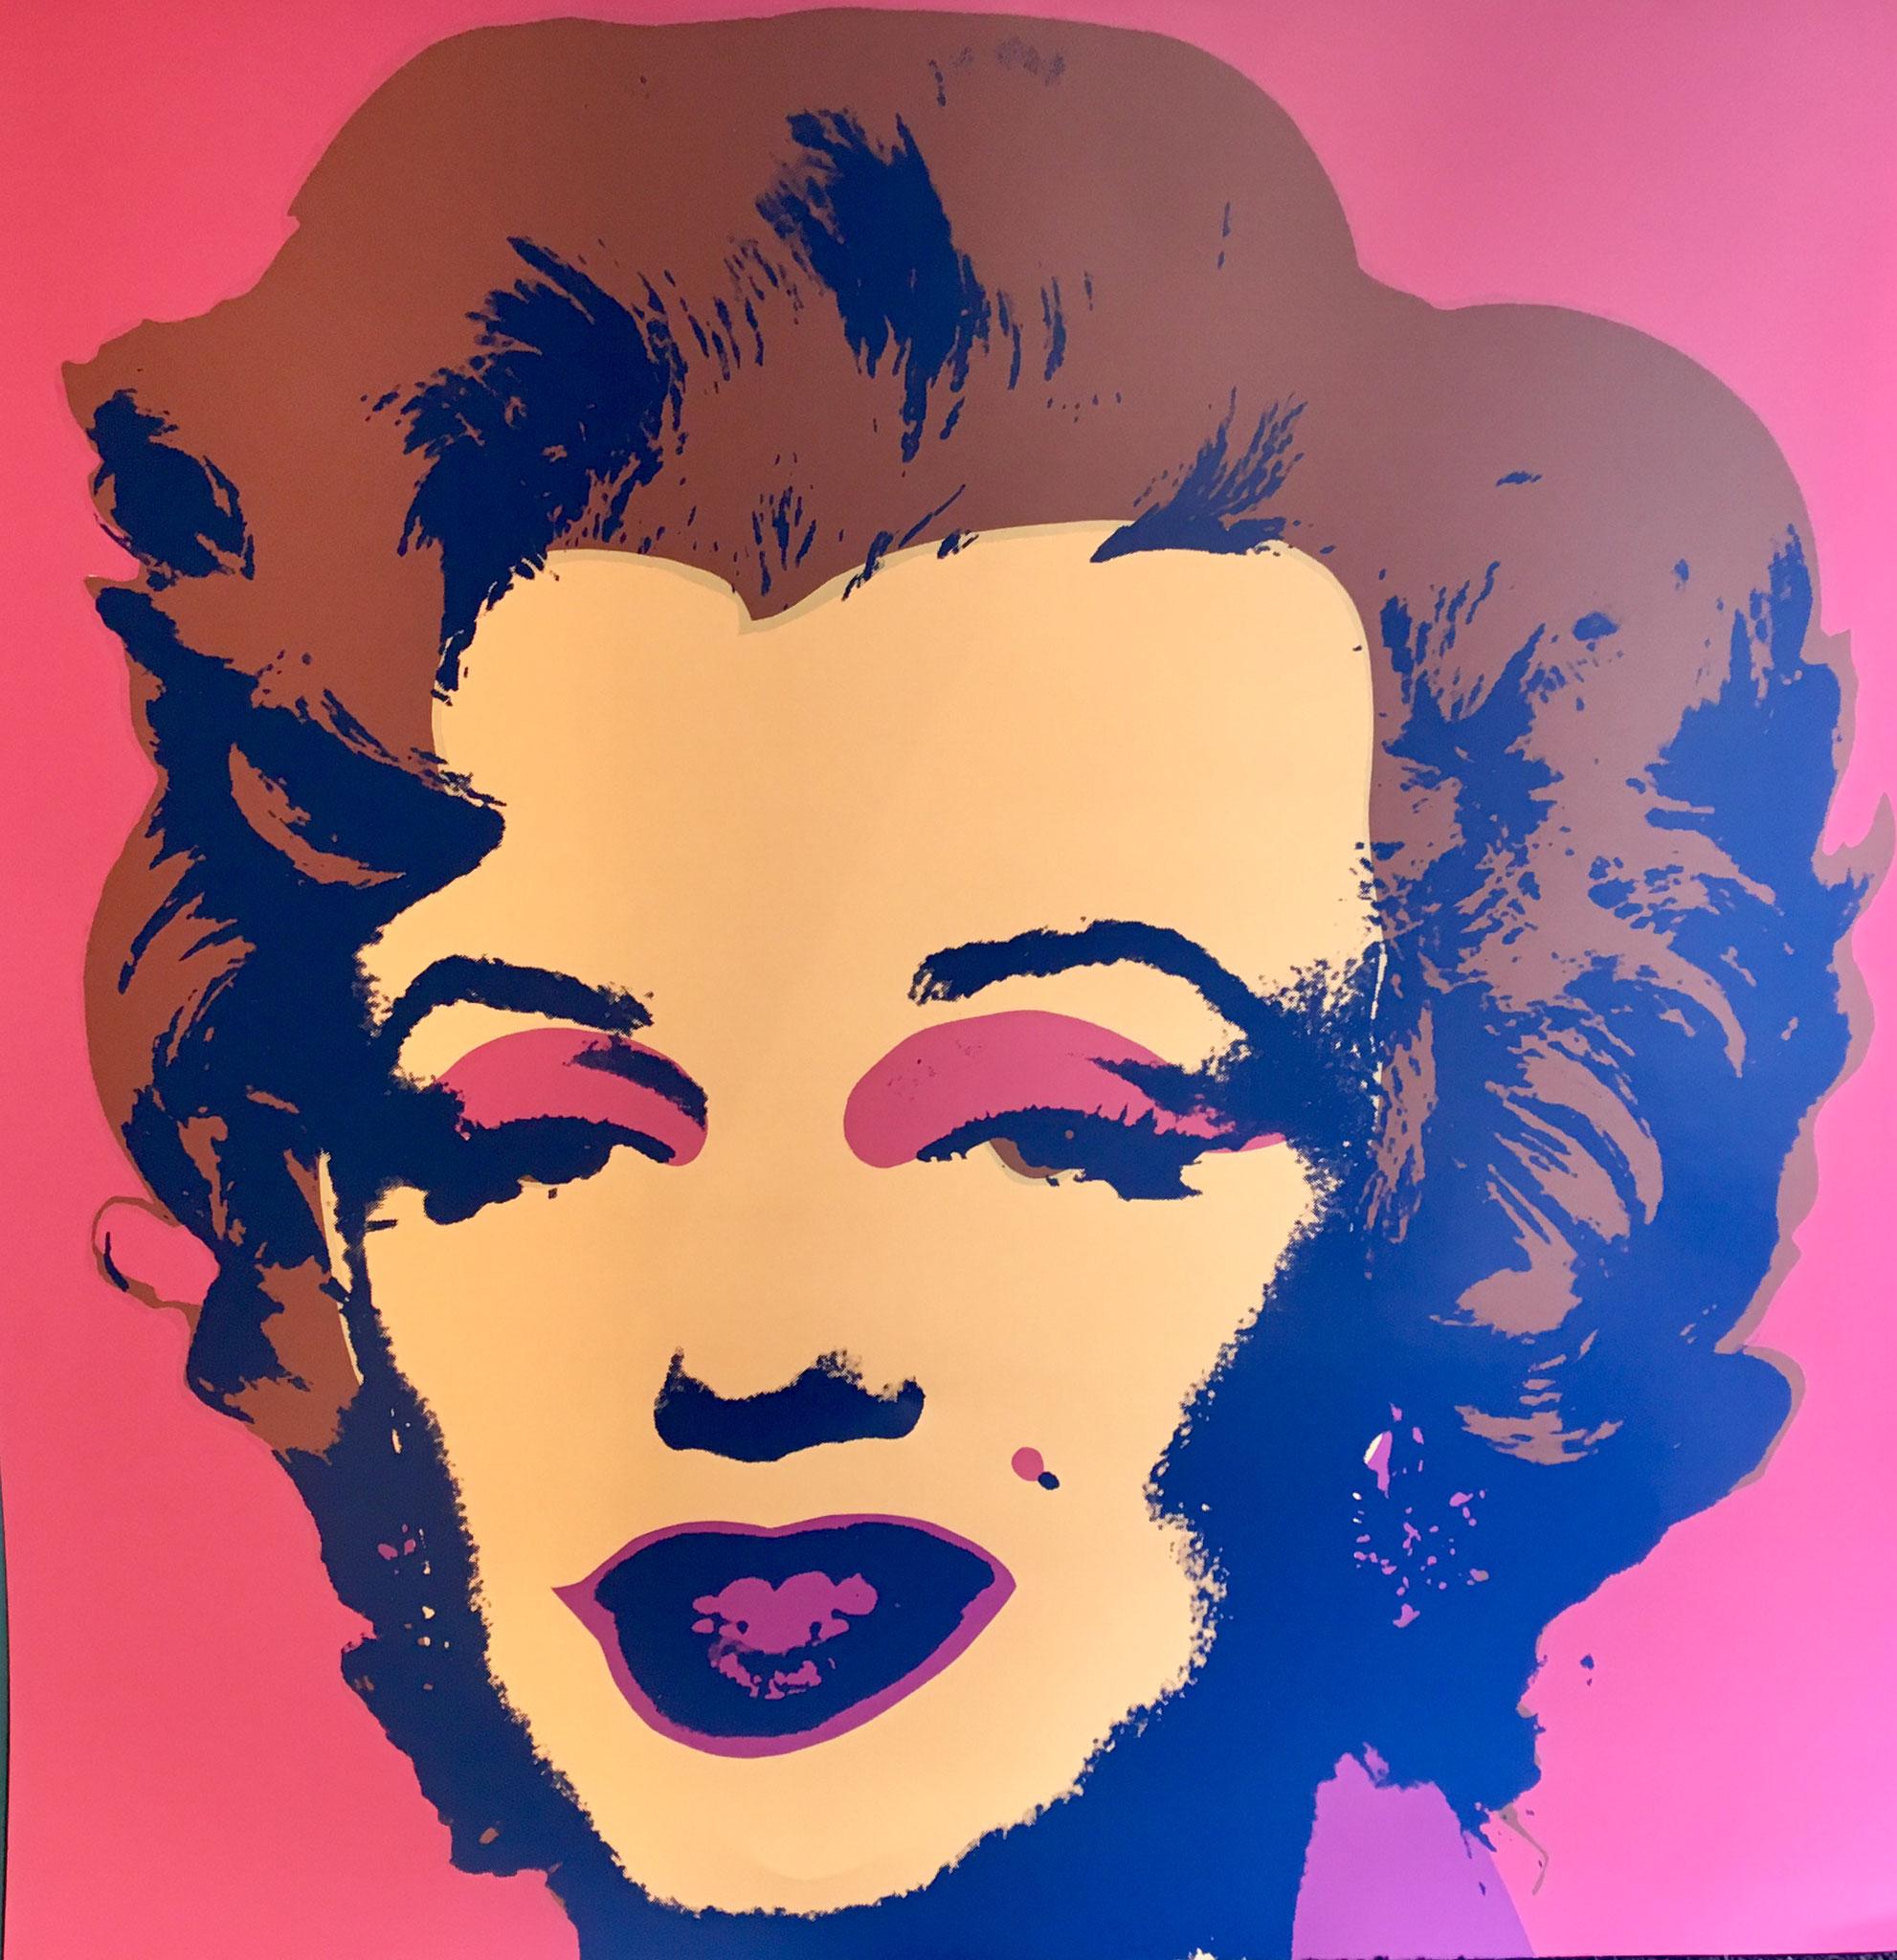 Andy Warhol, serigraphie